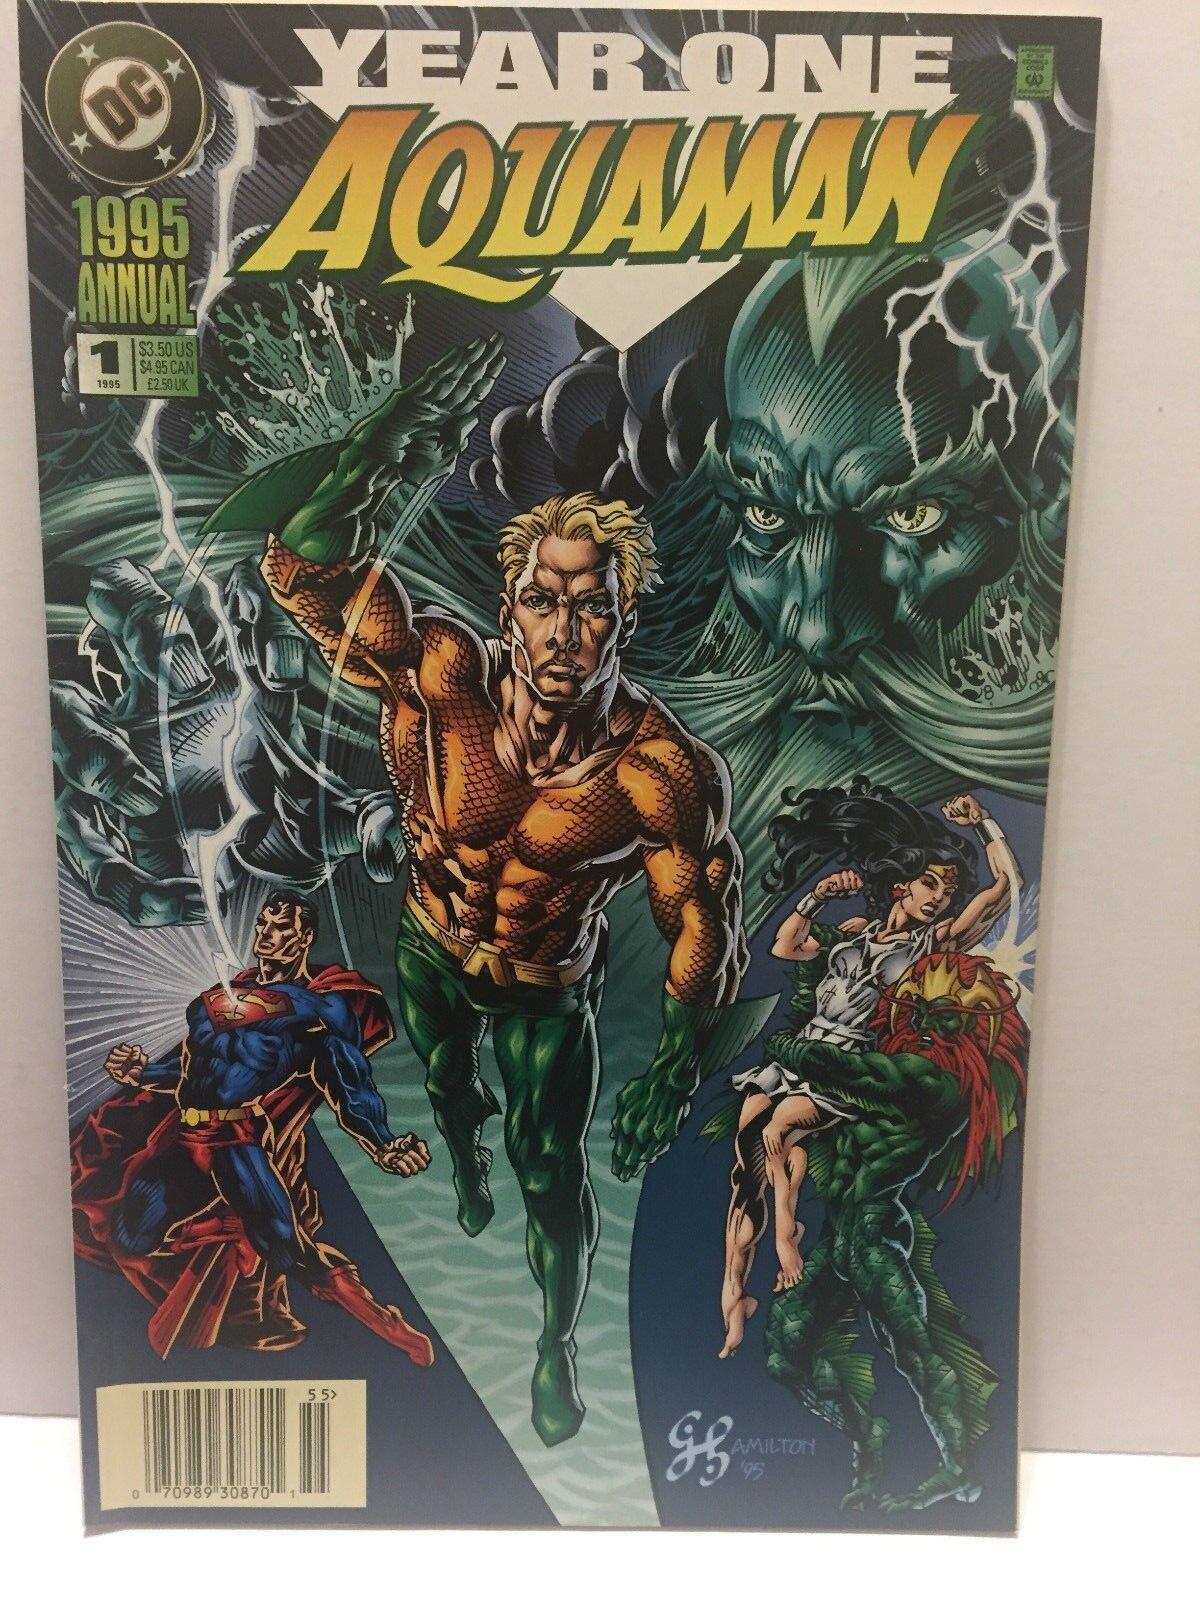 1995 DC Comics Year One Aquaman Annual - $1.95